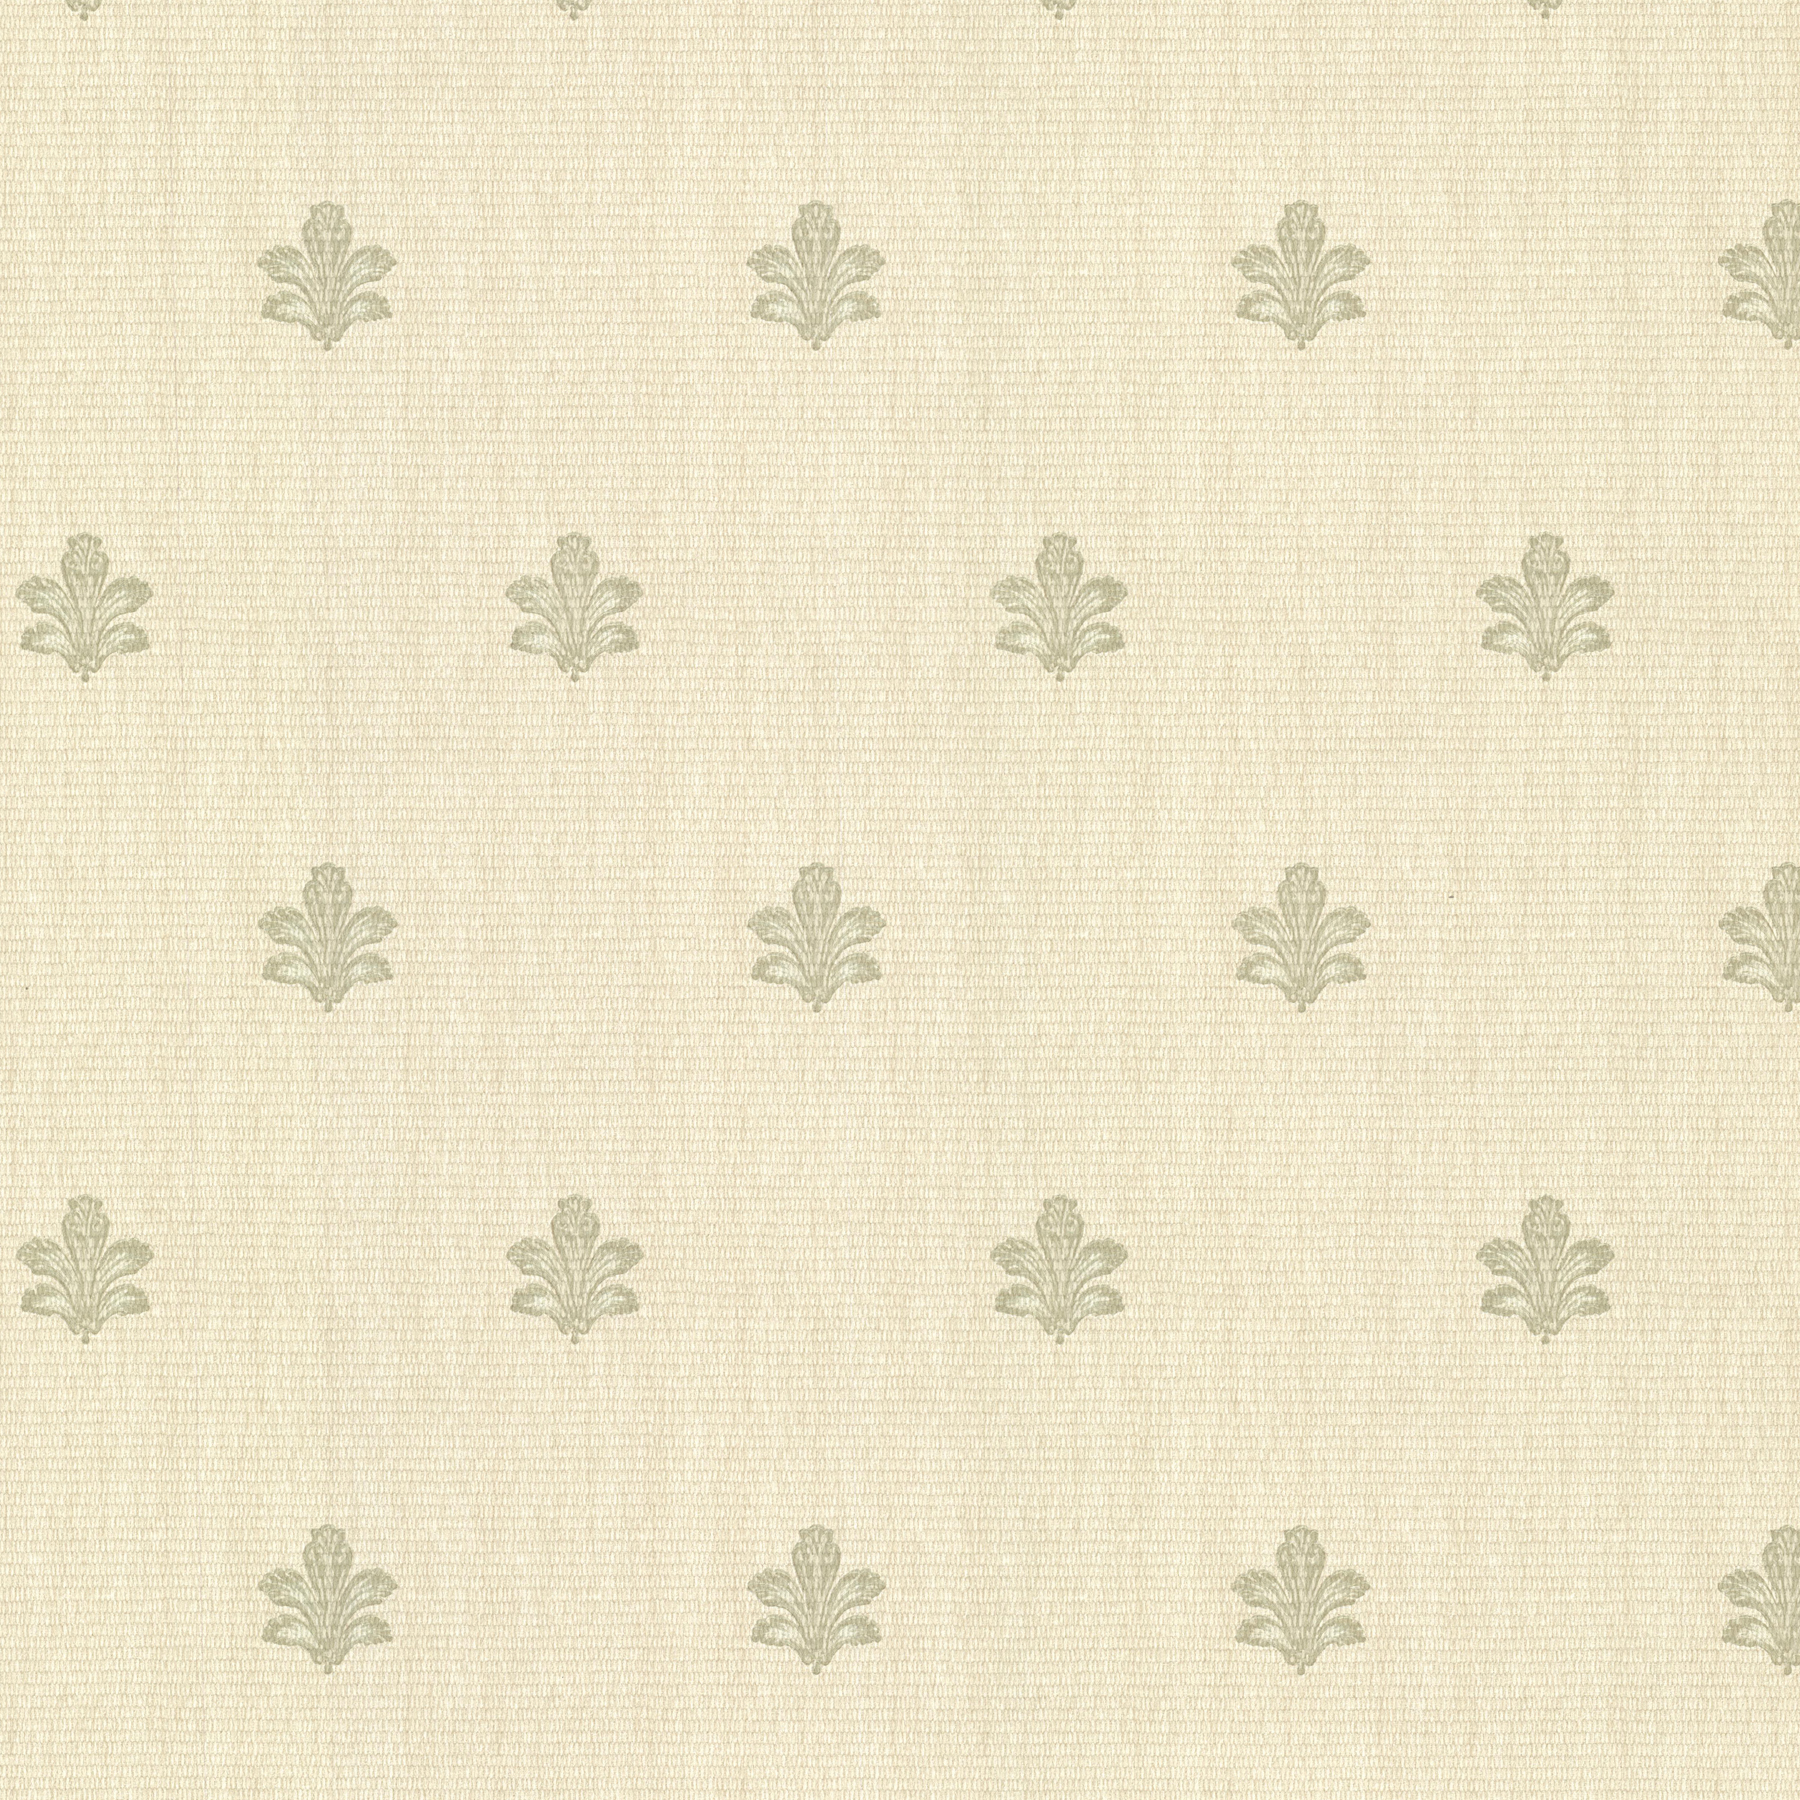 Picture of Bolton Light Green Fleur De Lis Wallpaper